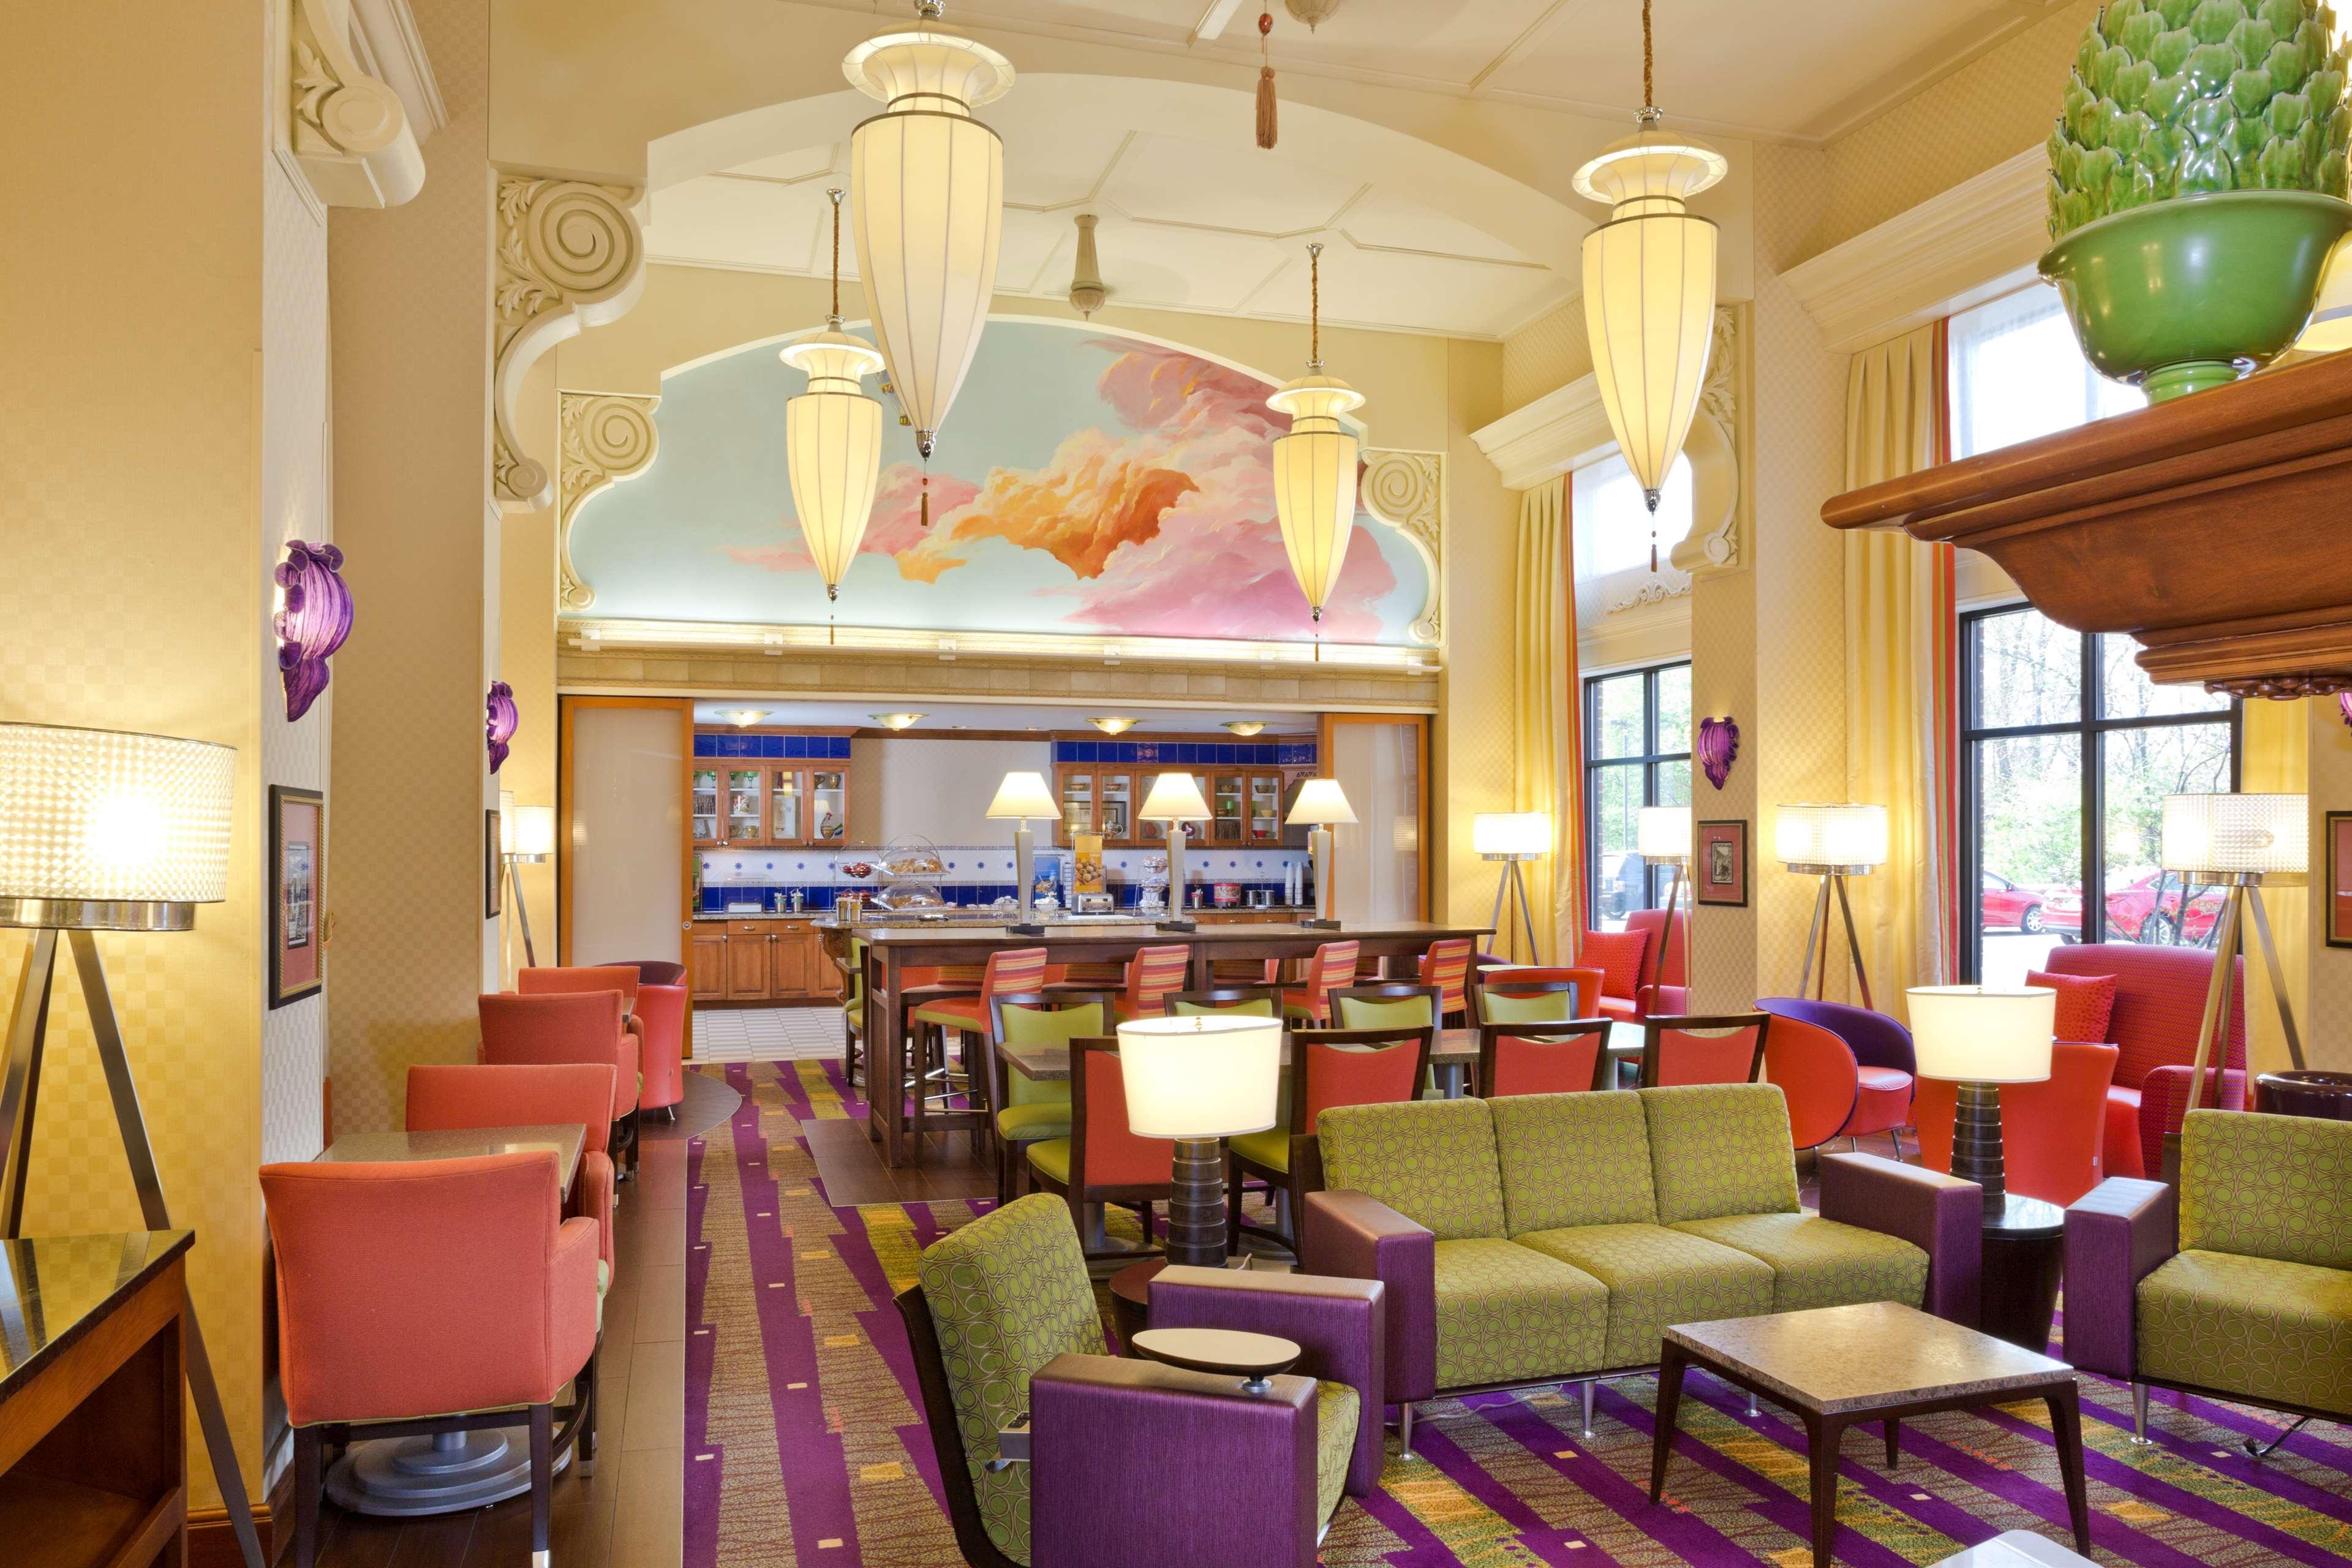 Hampton Inn & Suites Arundel Mills/Baltimore image 0